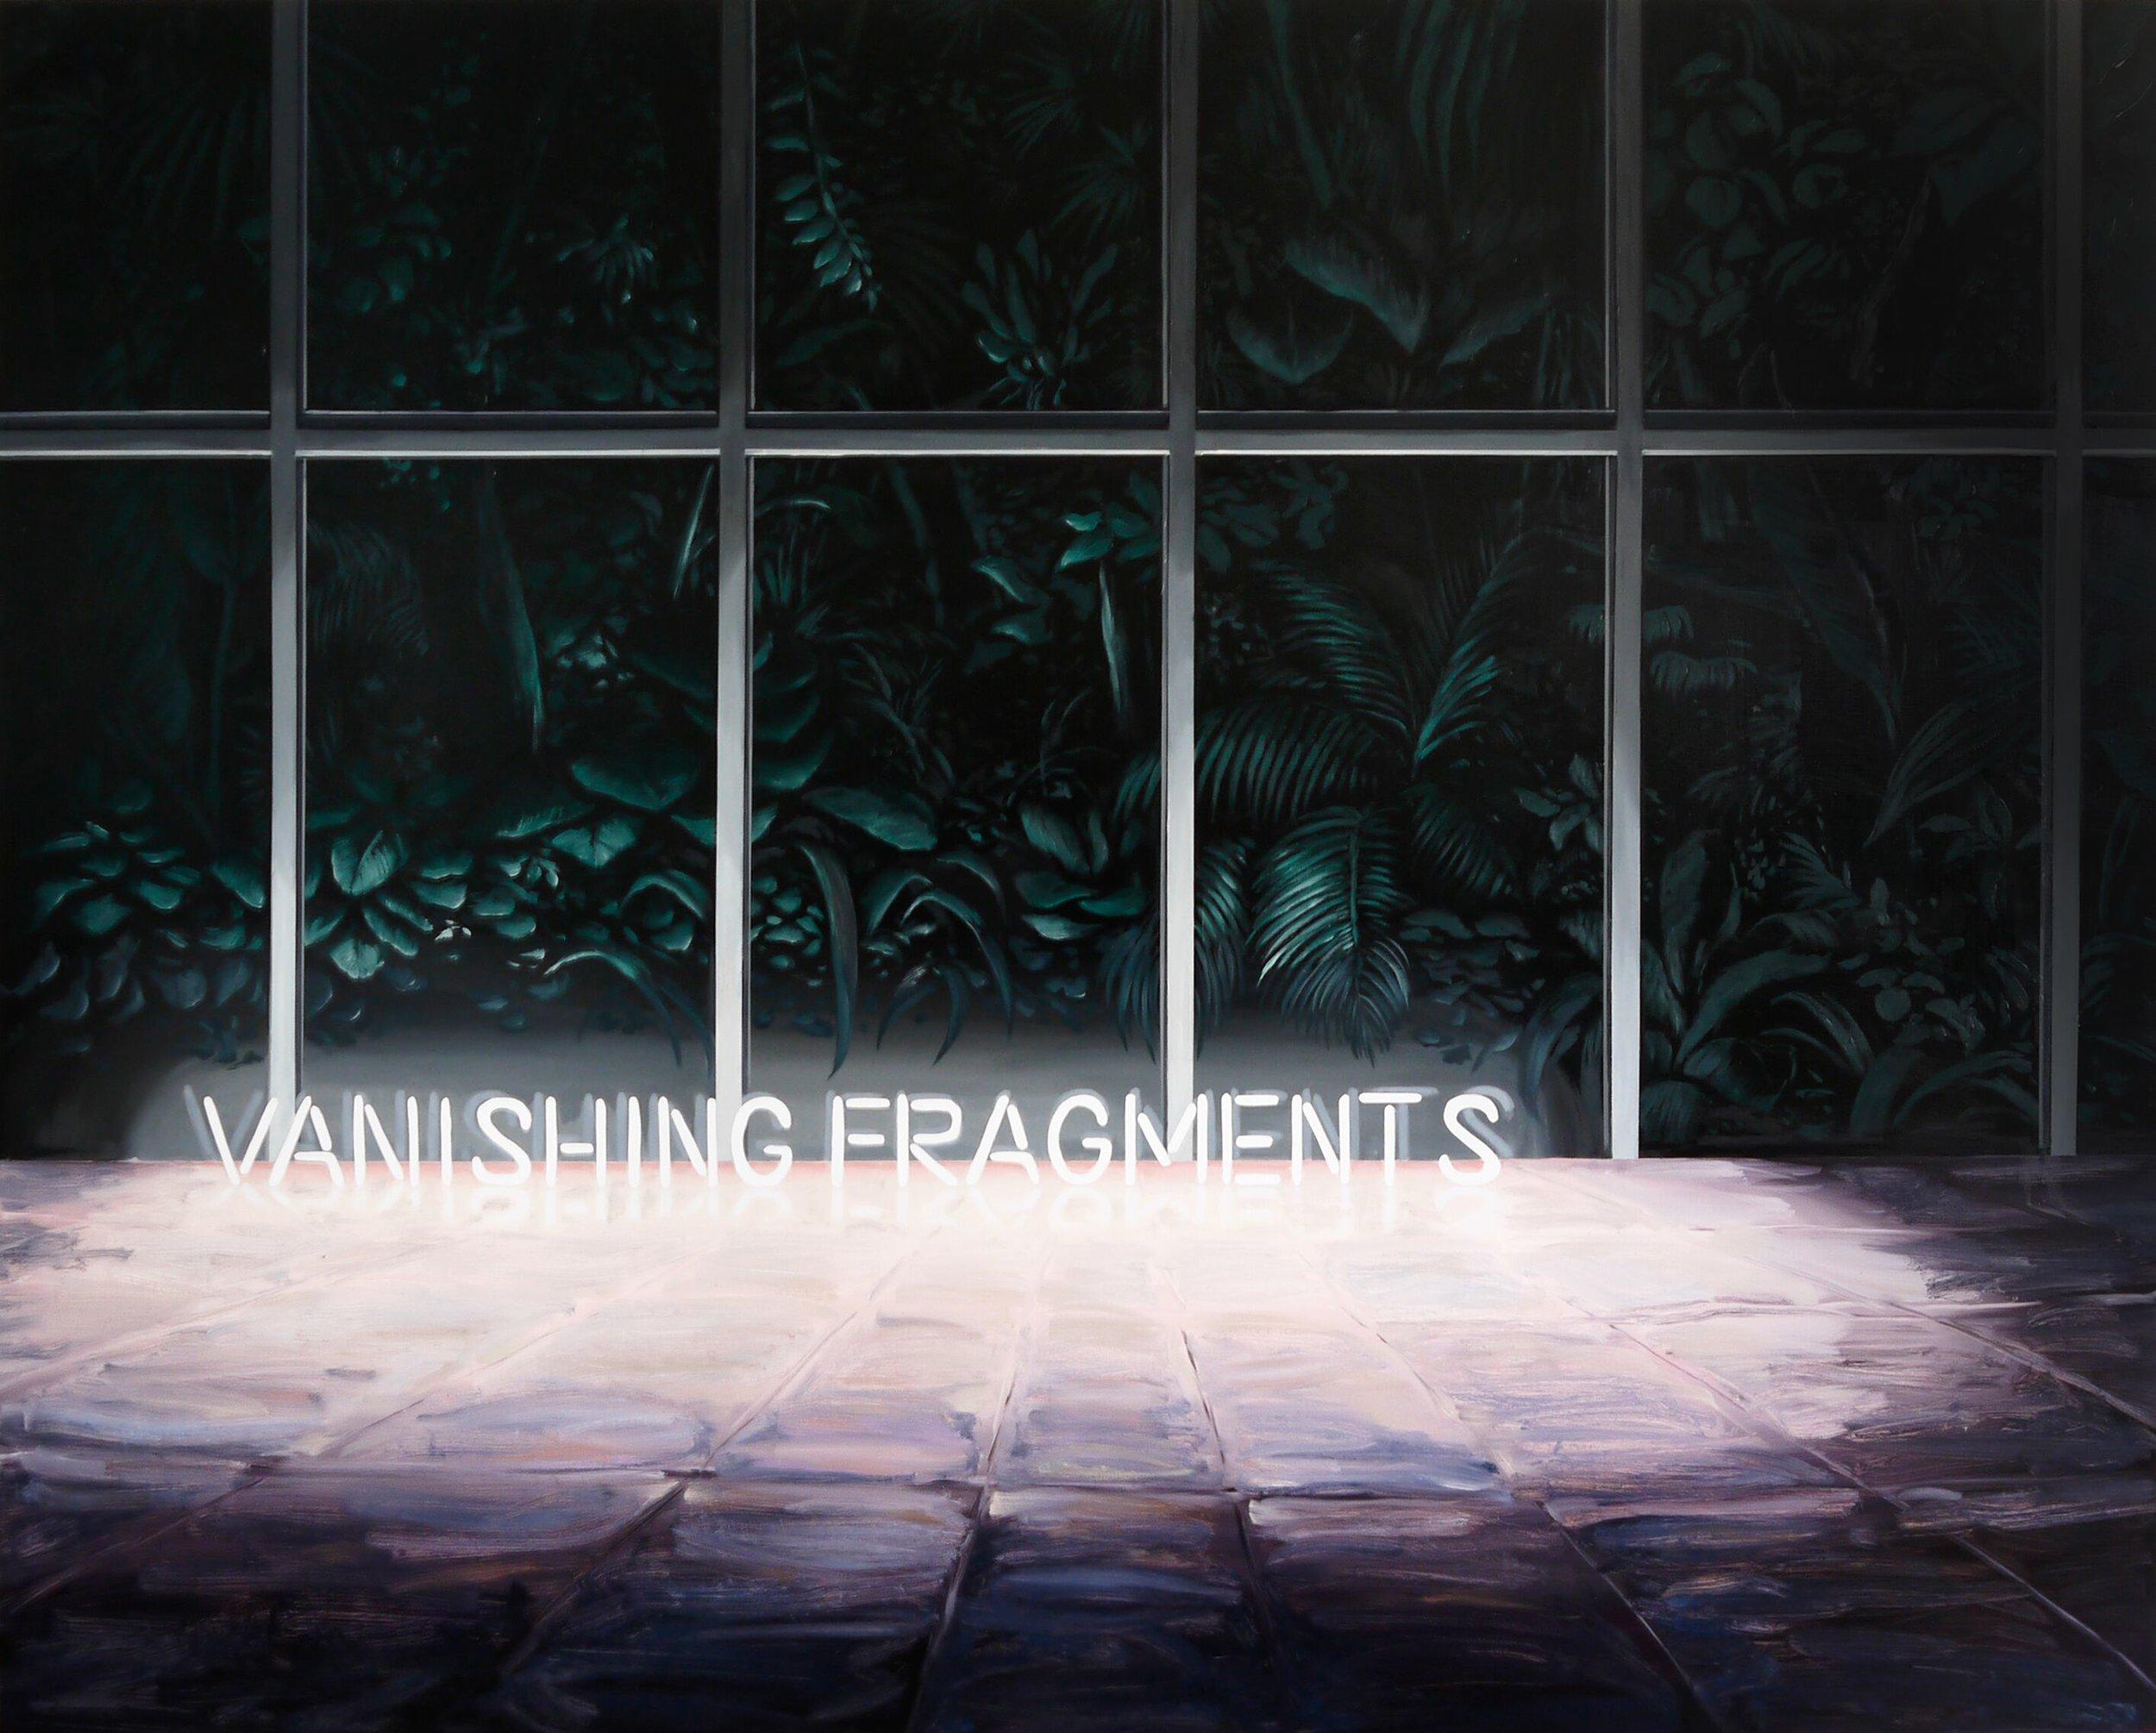 Vanishing Fragments  (2019), oil on canvas, 130 x 162 cm